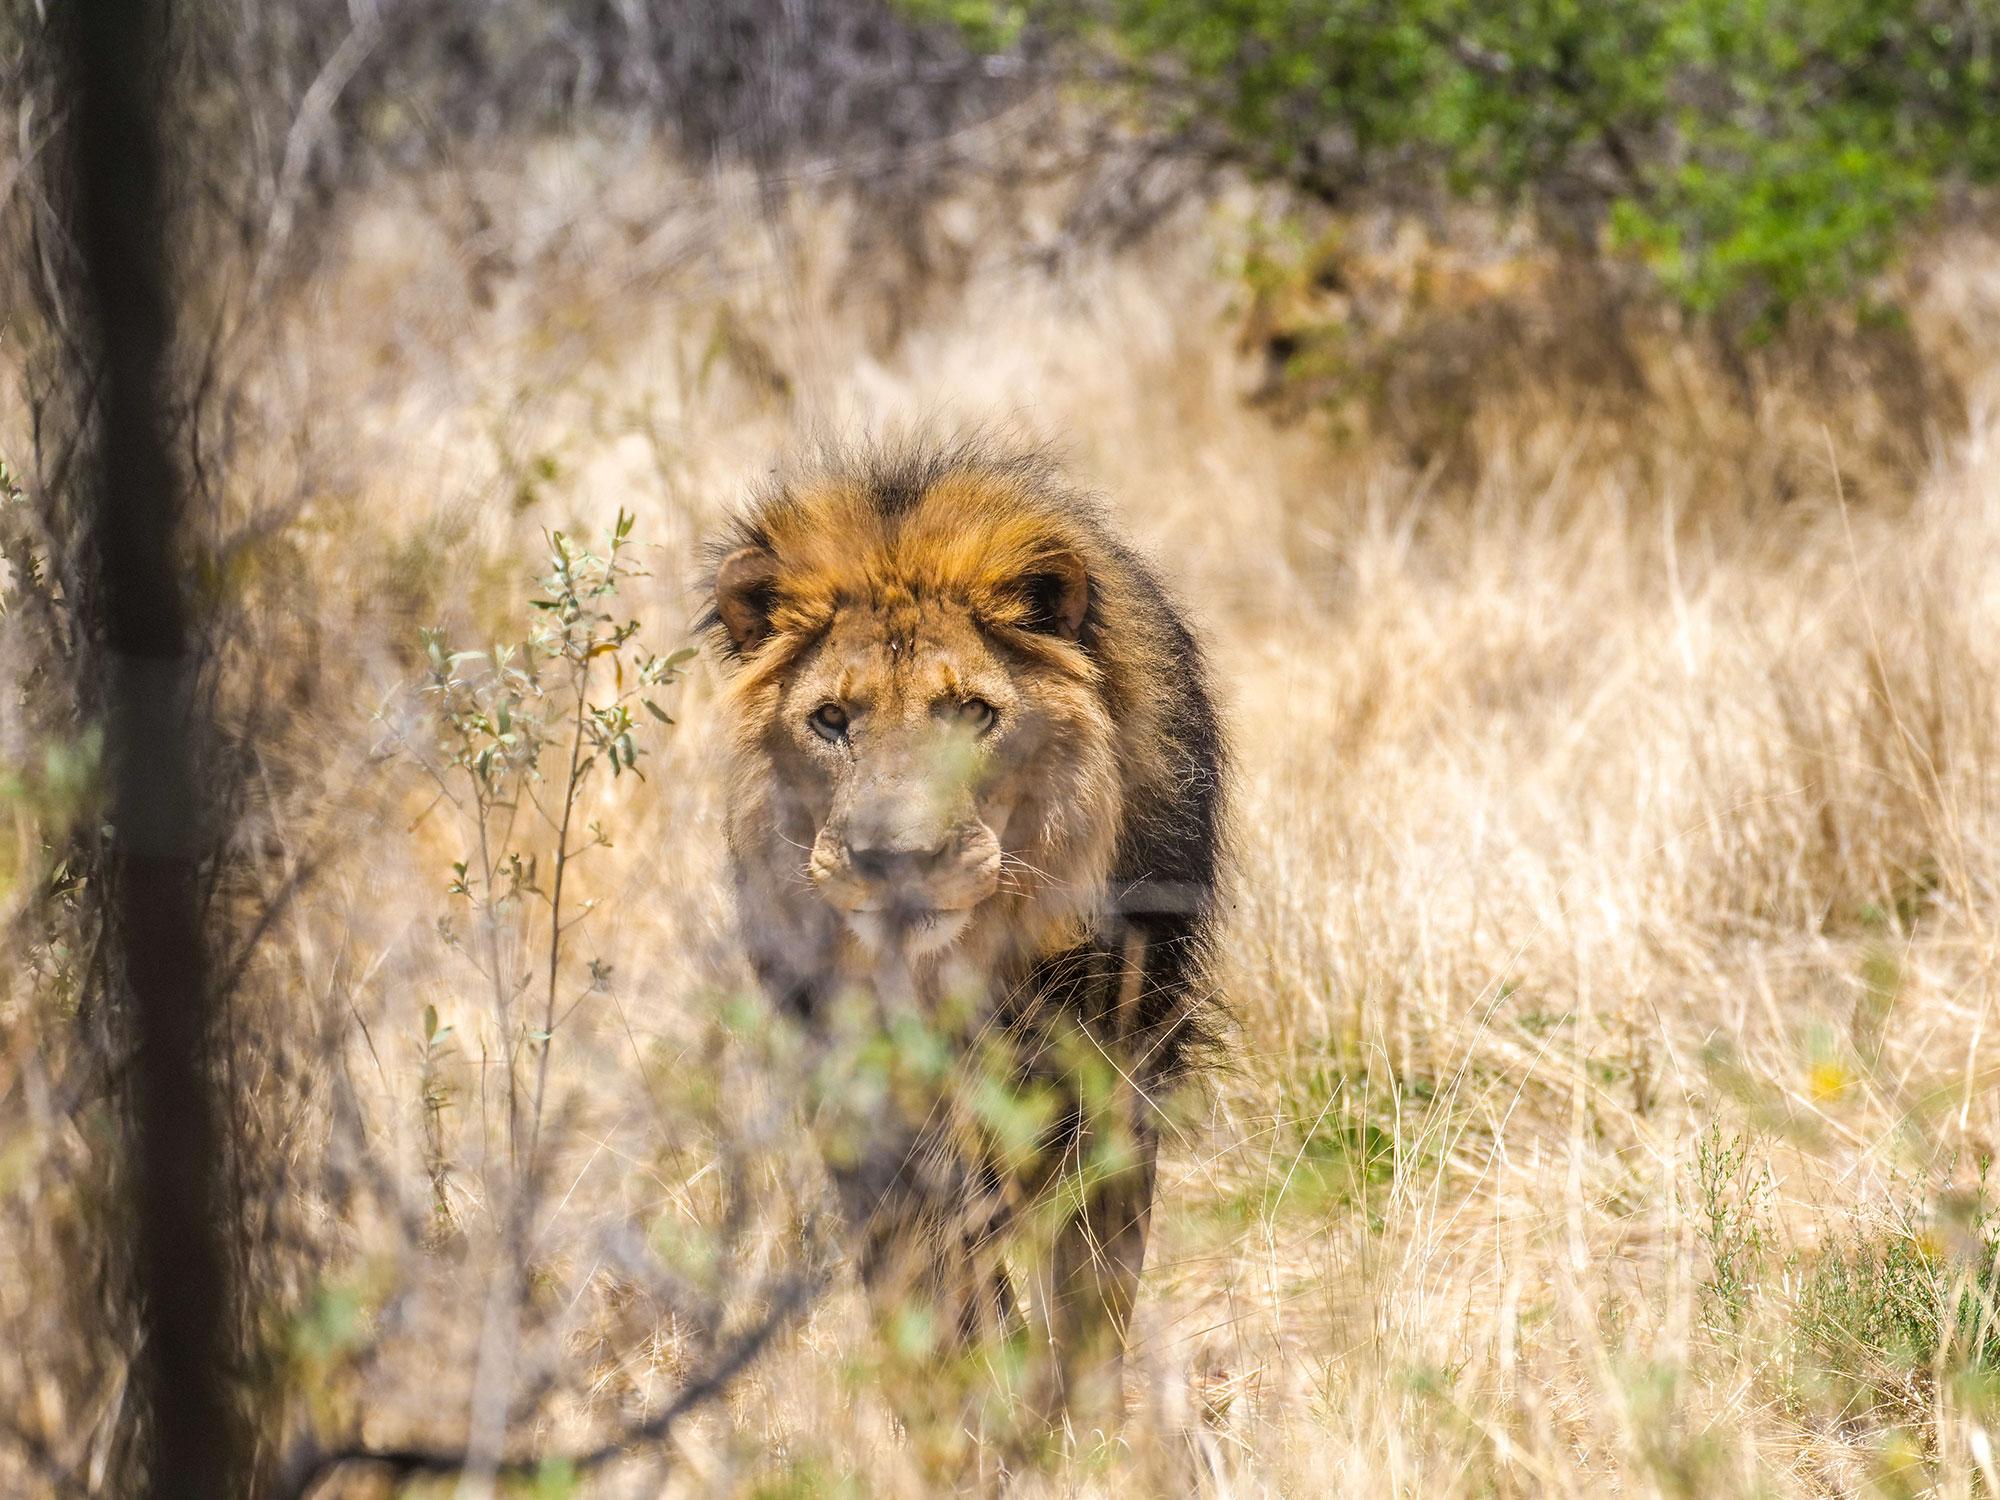 Lion at N/a'an ku sê (Naankuse) Wildlife Sanctuary in Namibia, Africa